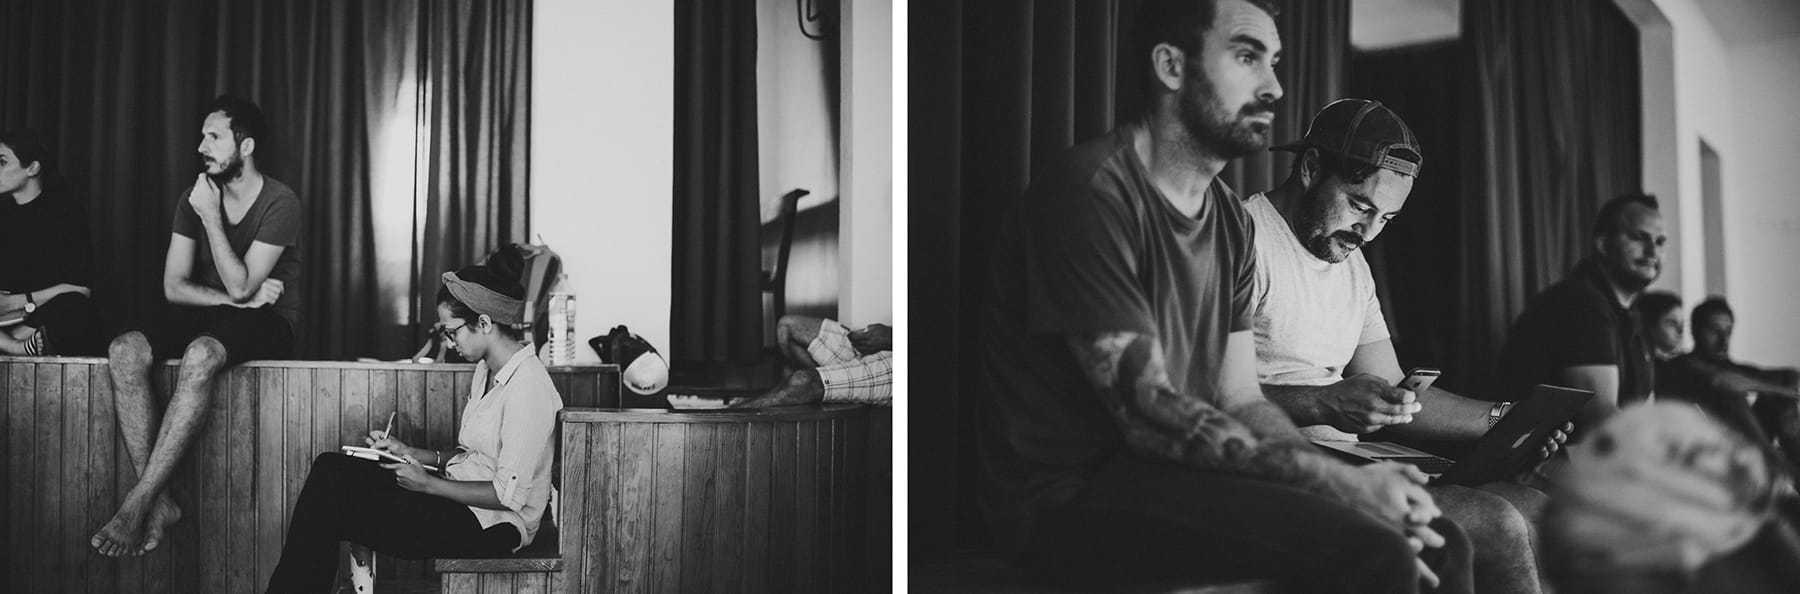 wolves_workshop_hilario_sanchez_fotografo_boda_españa_437